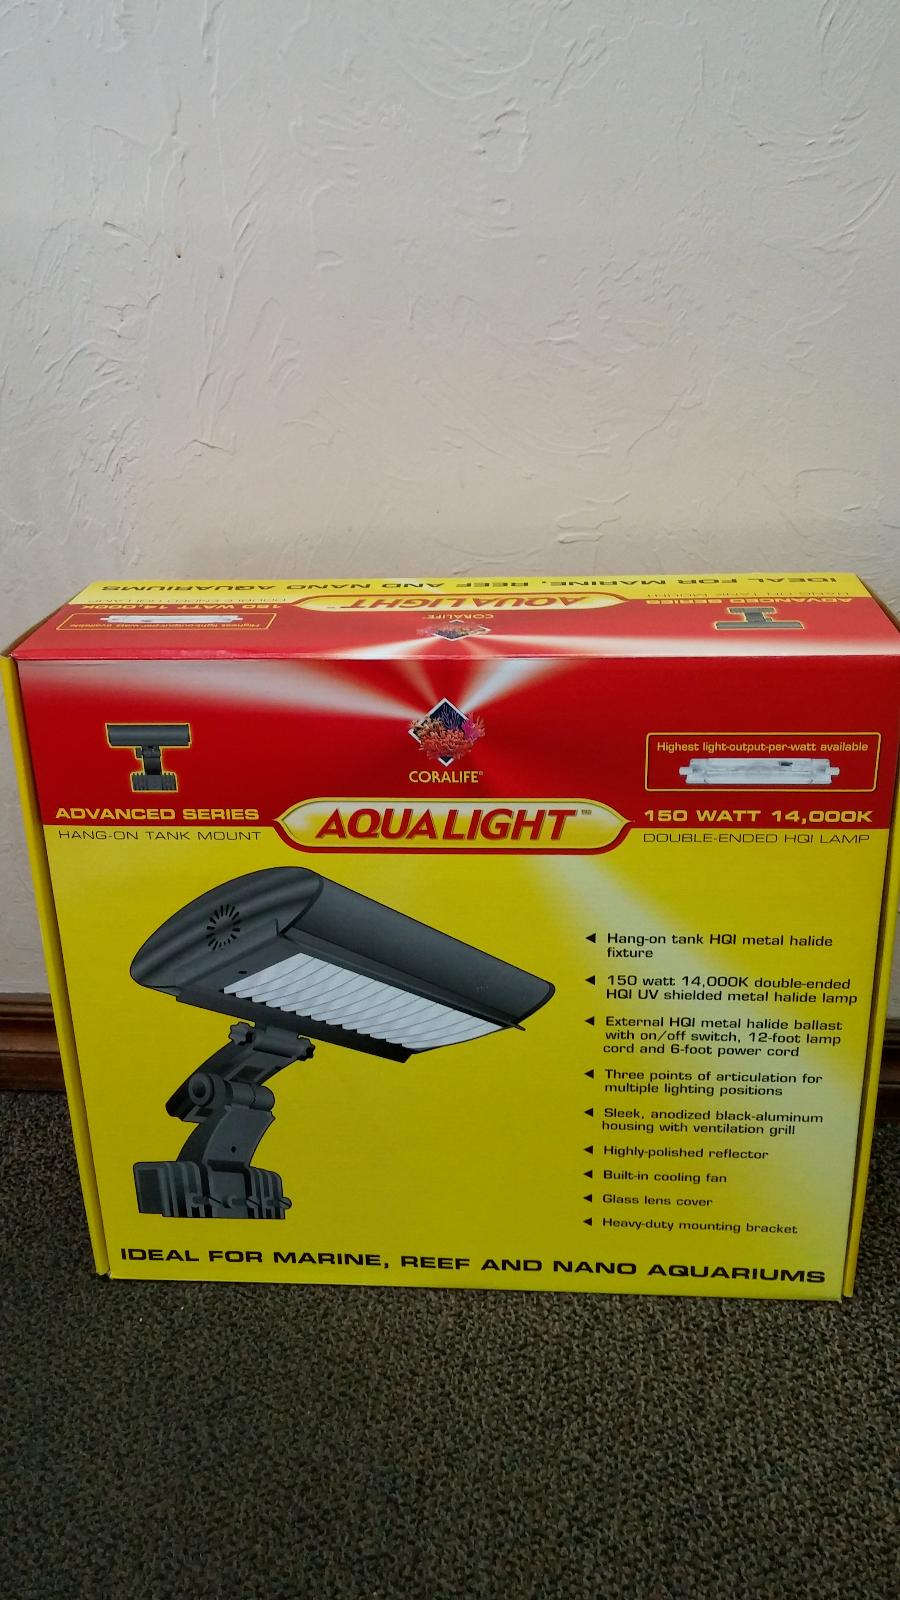 Coralife Aqualight 150W HQI Clamp on Lamp Lighting Fixture w 1 LEDs & Fan